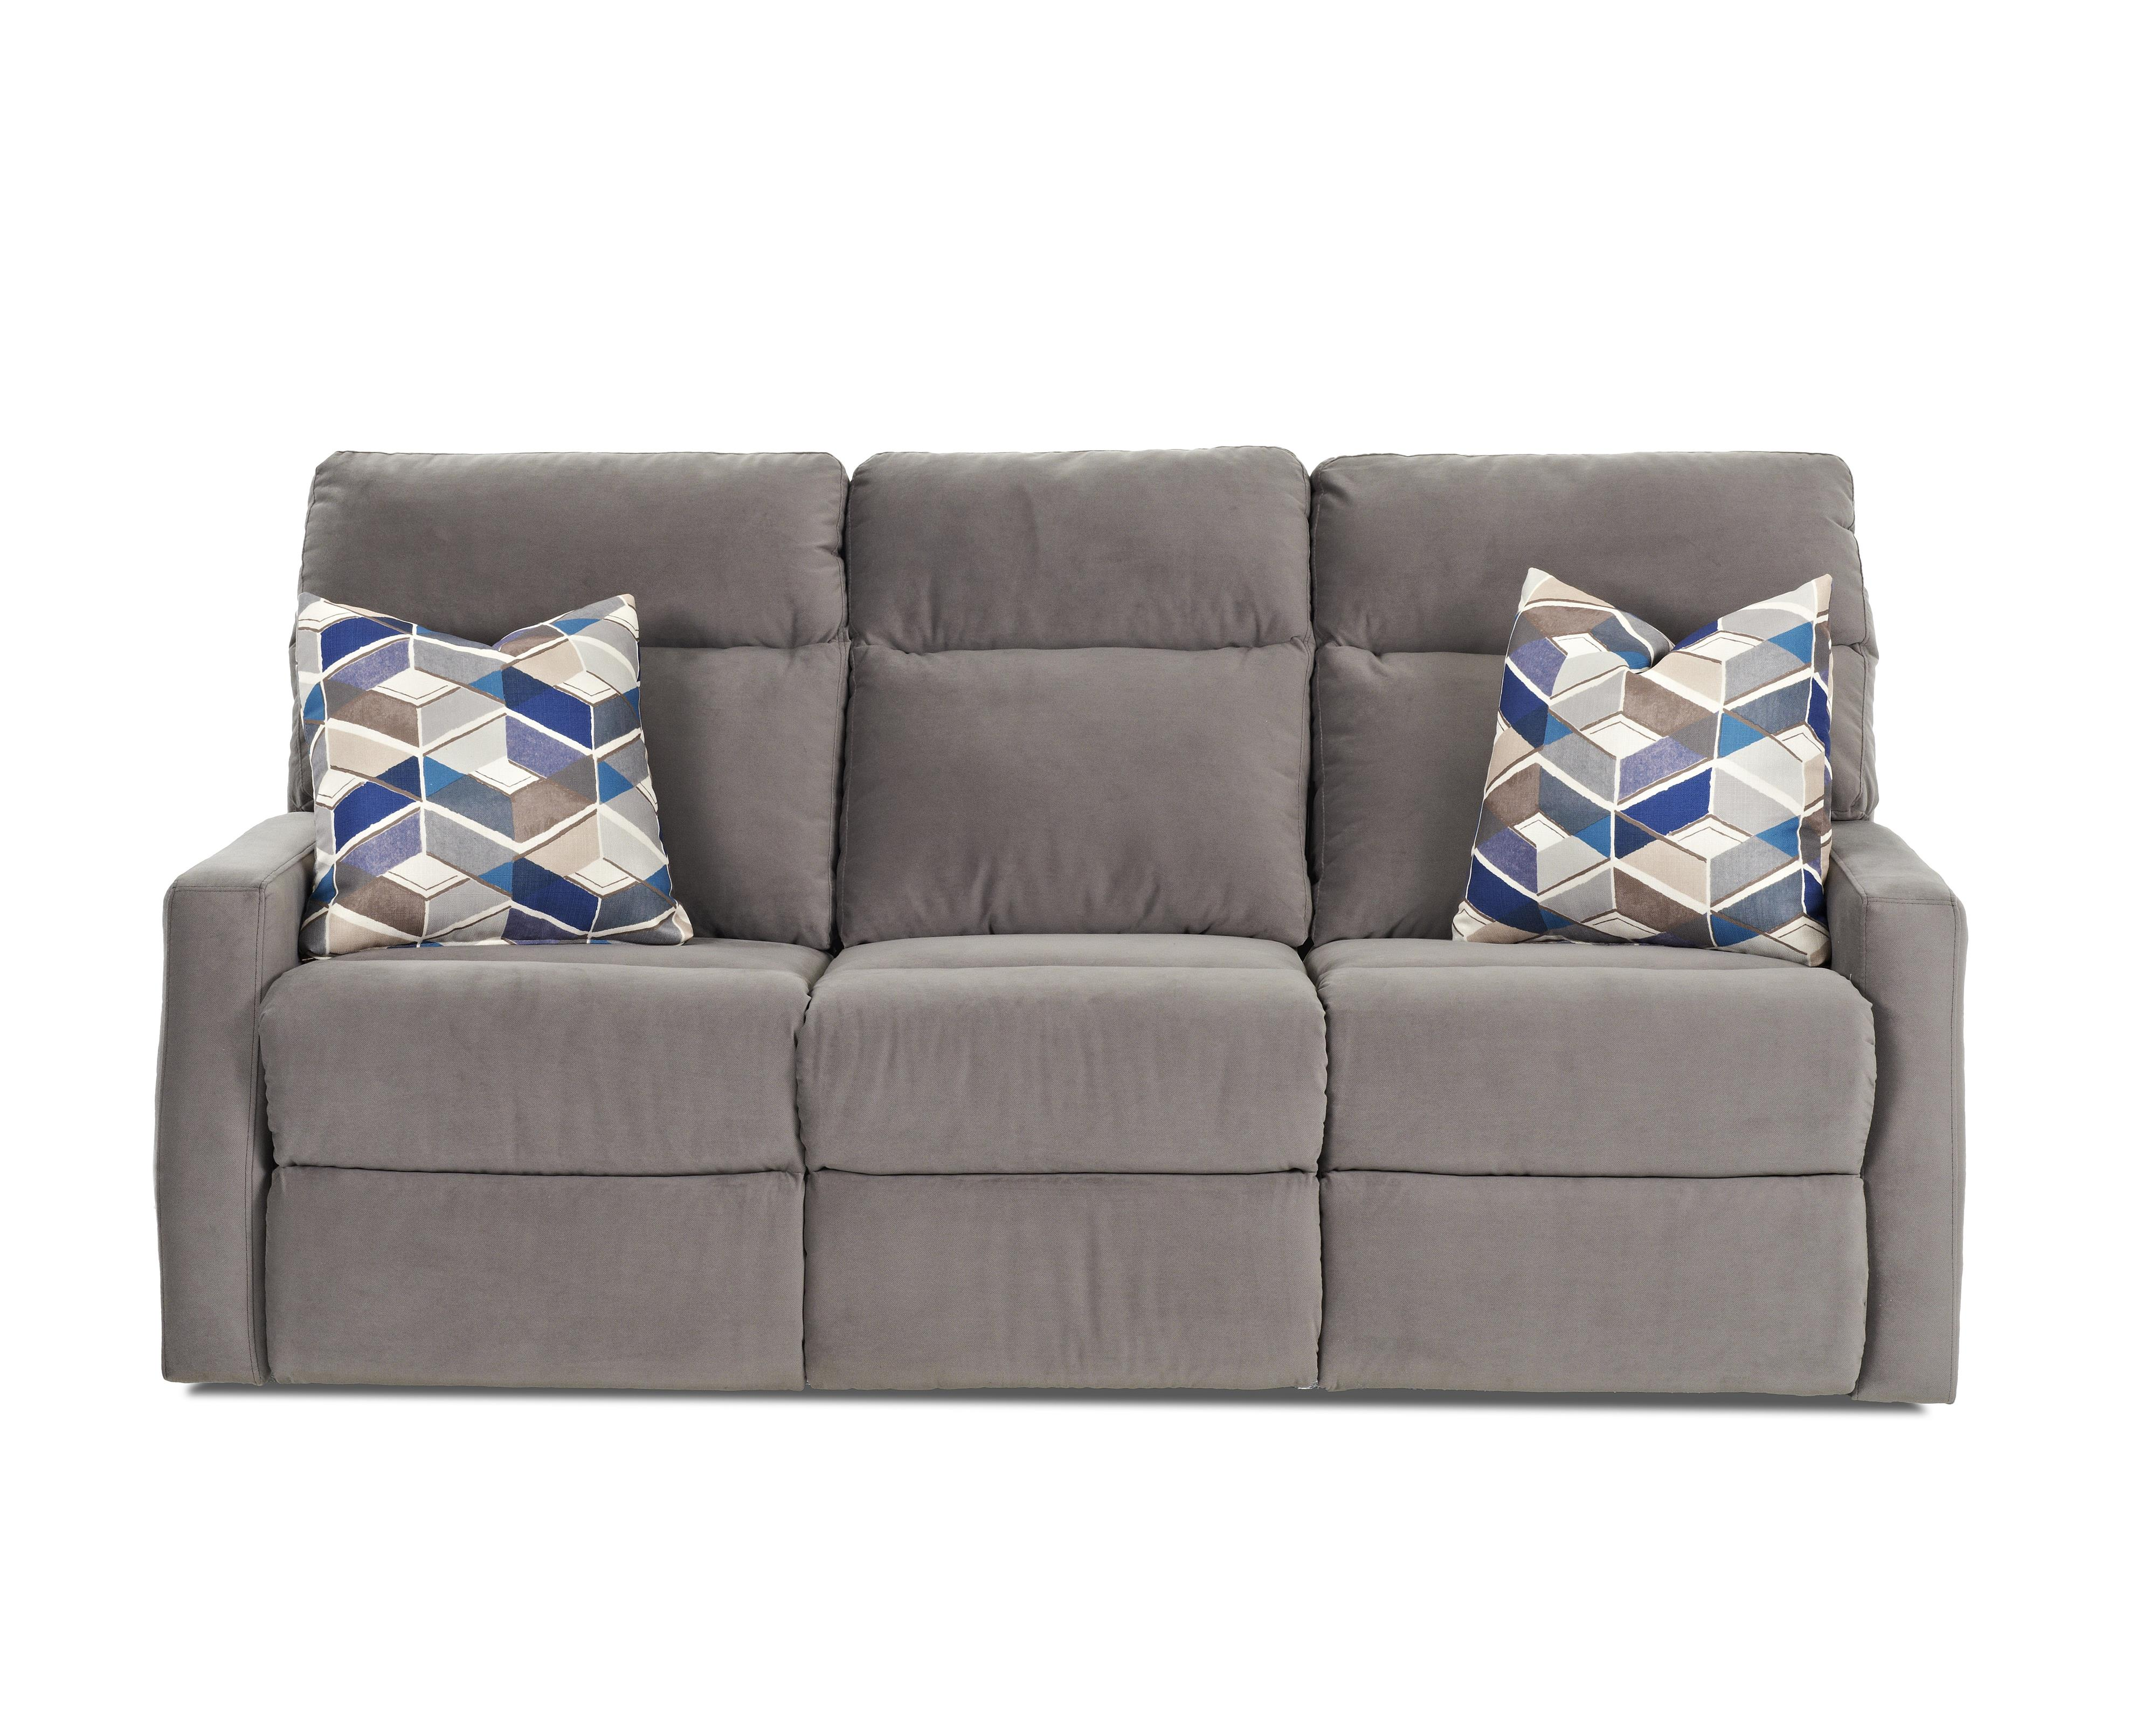 Klaussner Monticello Power Reclining Sofa w/ Pillows - Item Number: 41503P PWRS-OAKL-GRAP